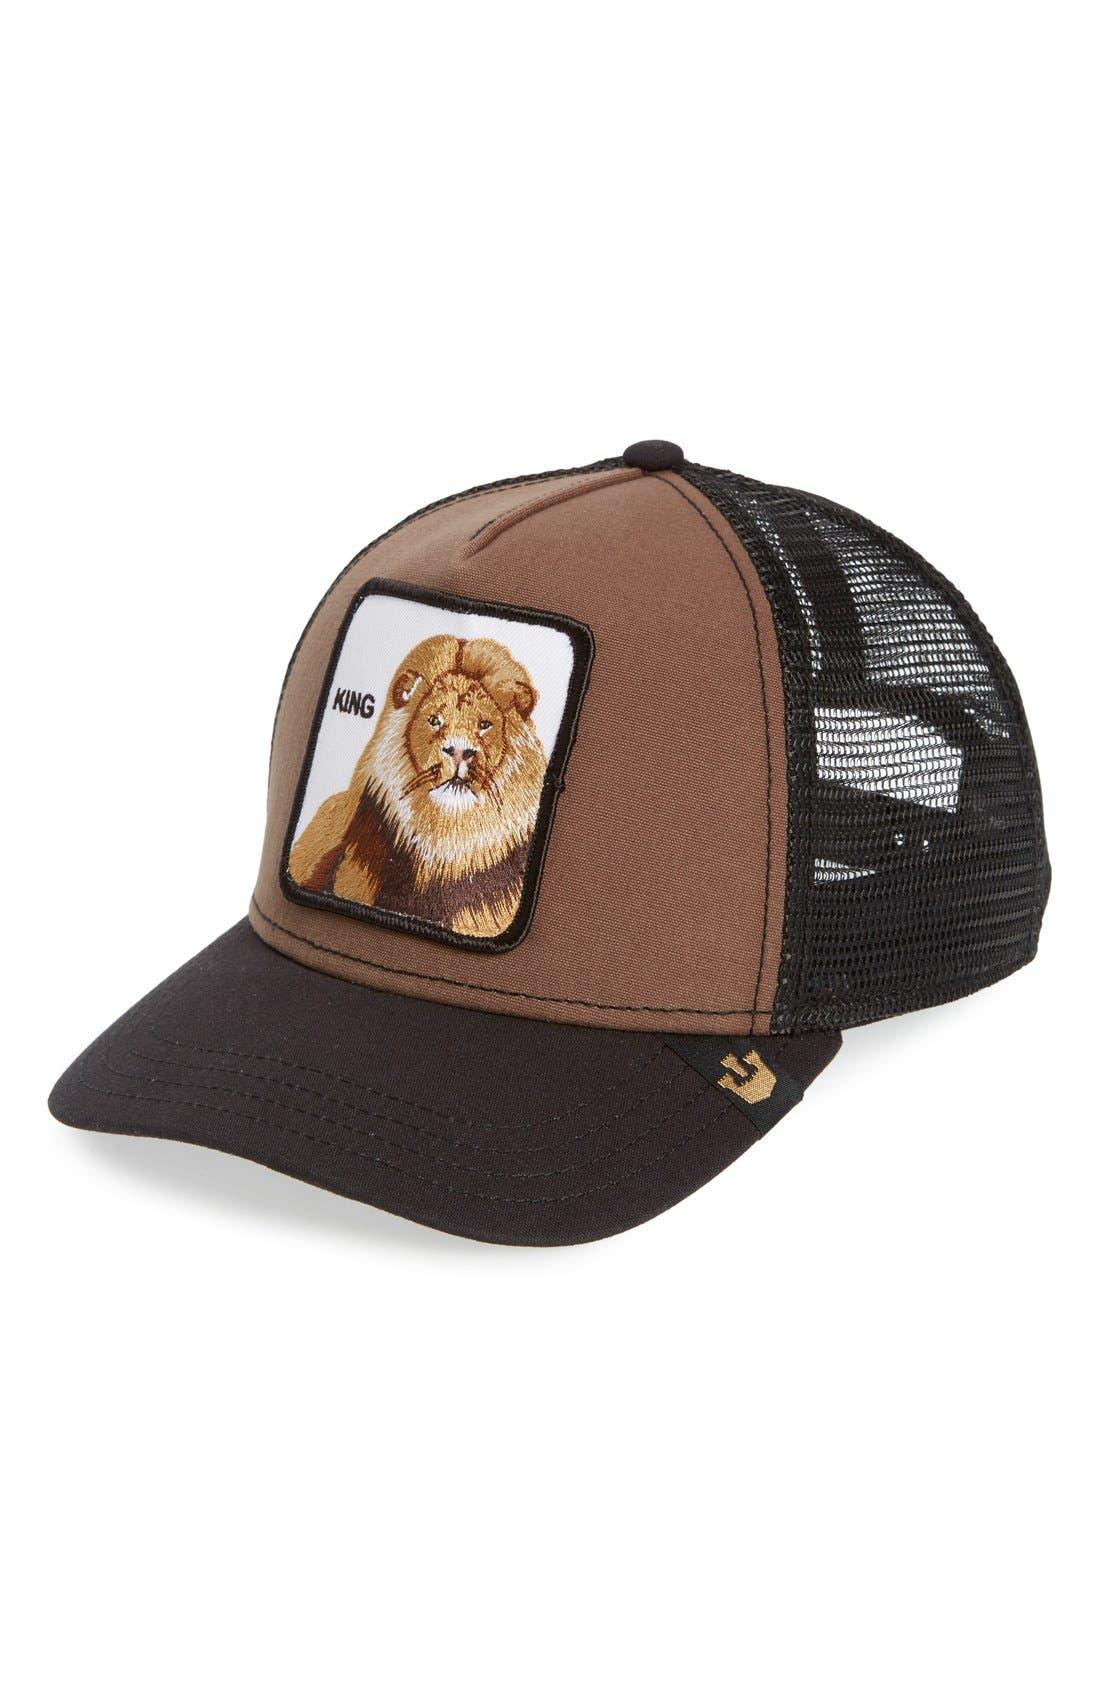 Goorin Brothers 'Animal Farm - King' Trucker Hat